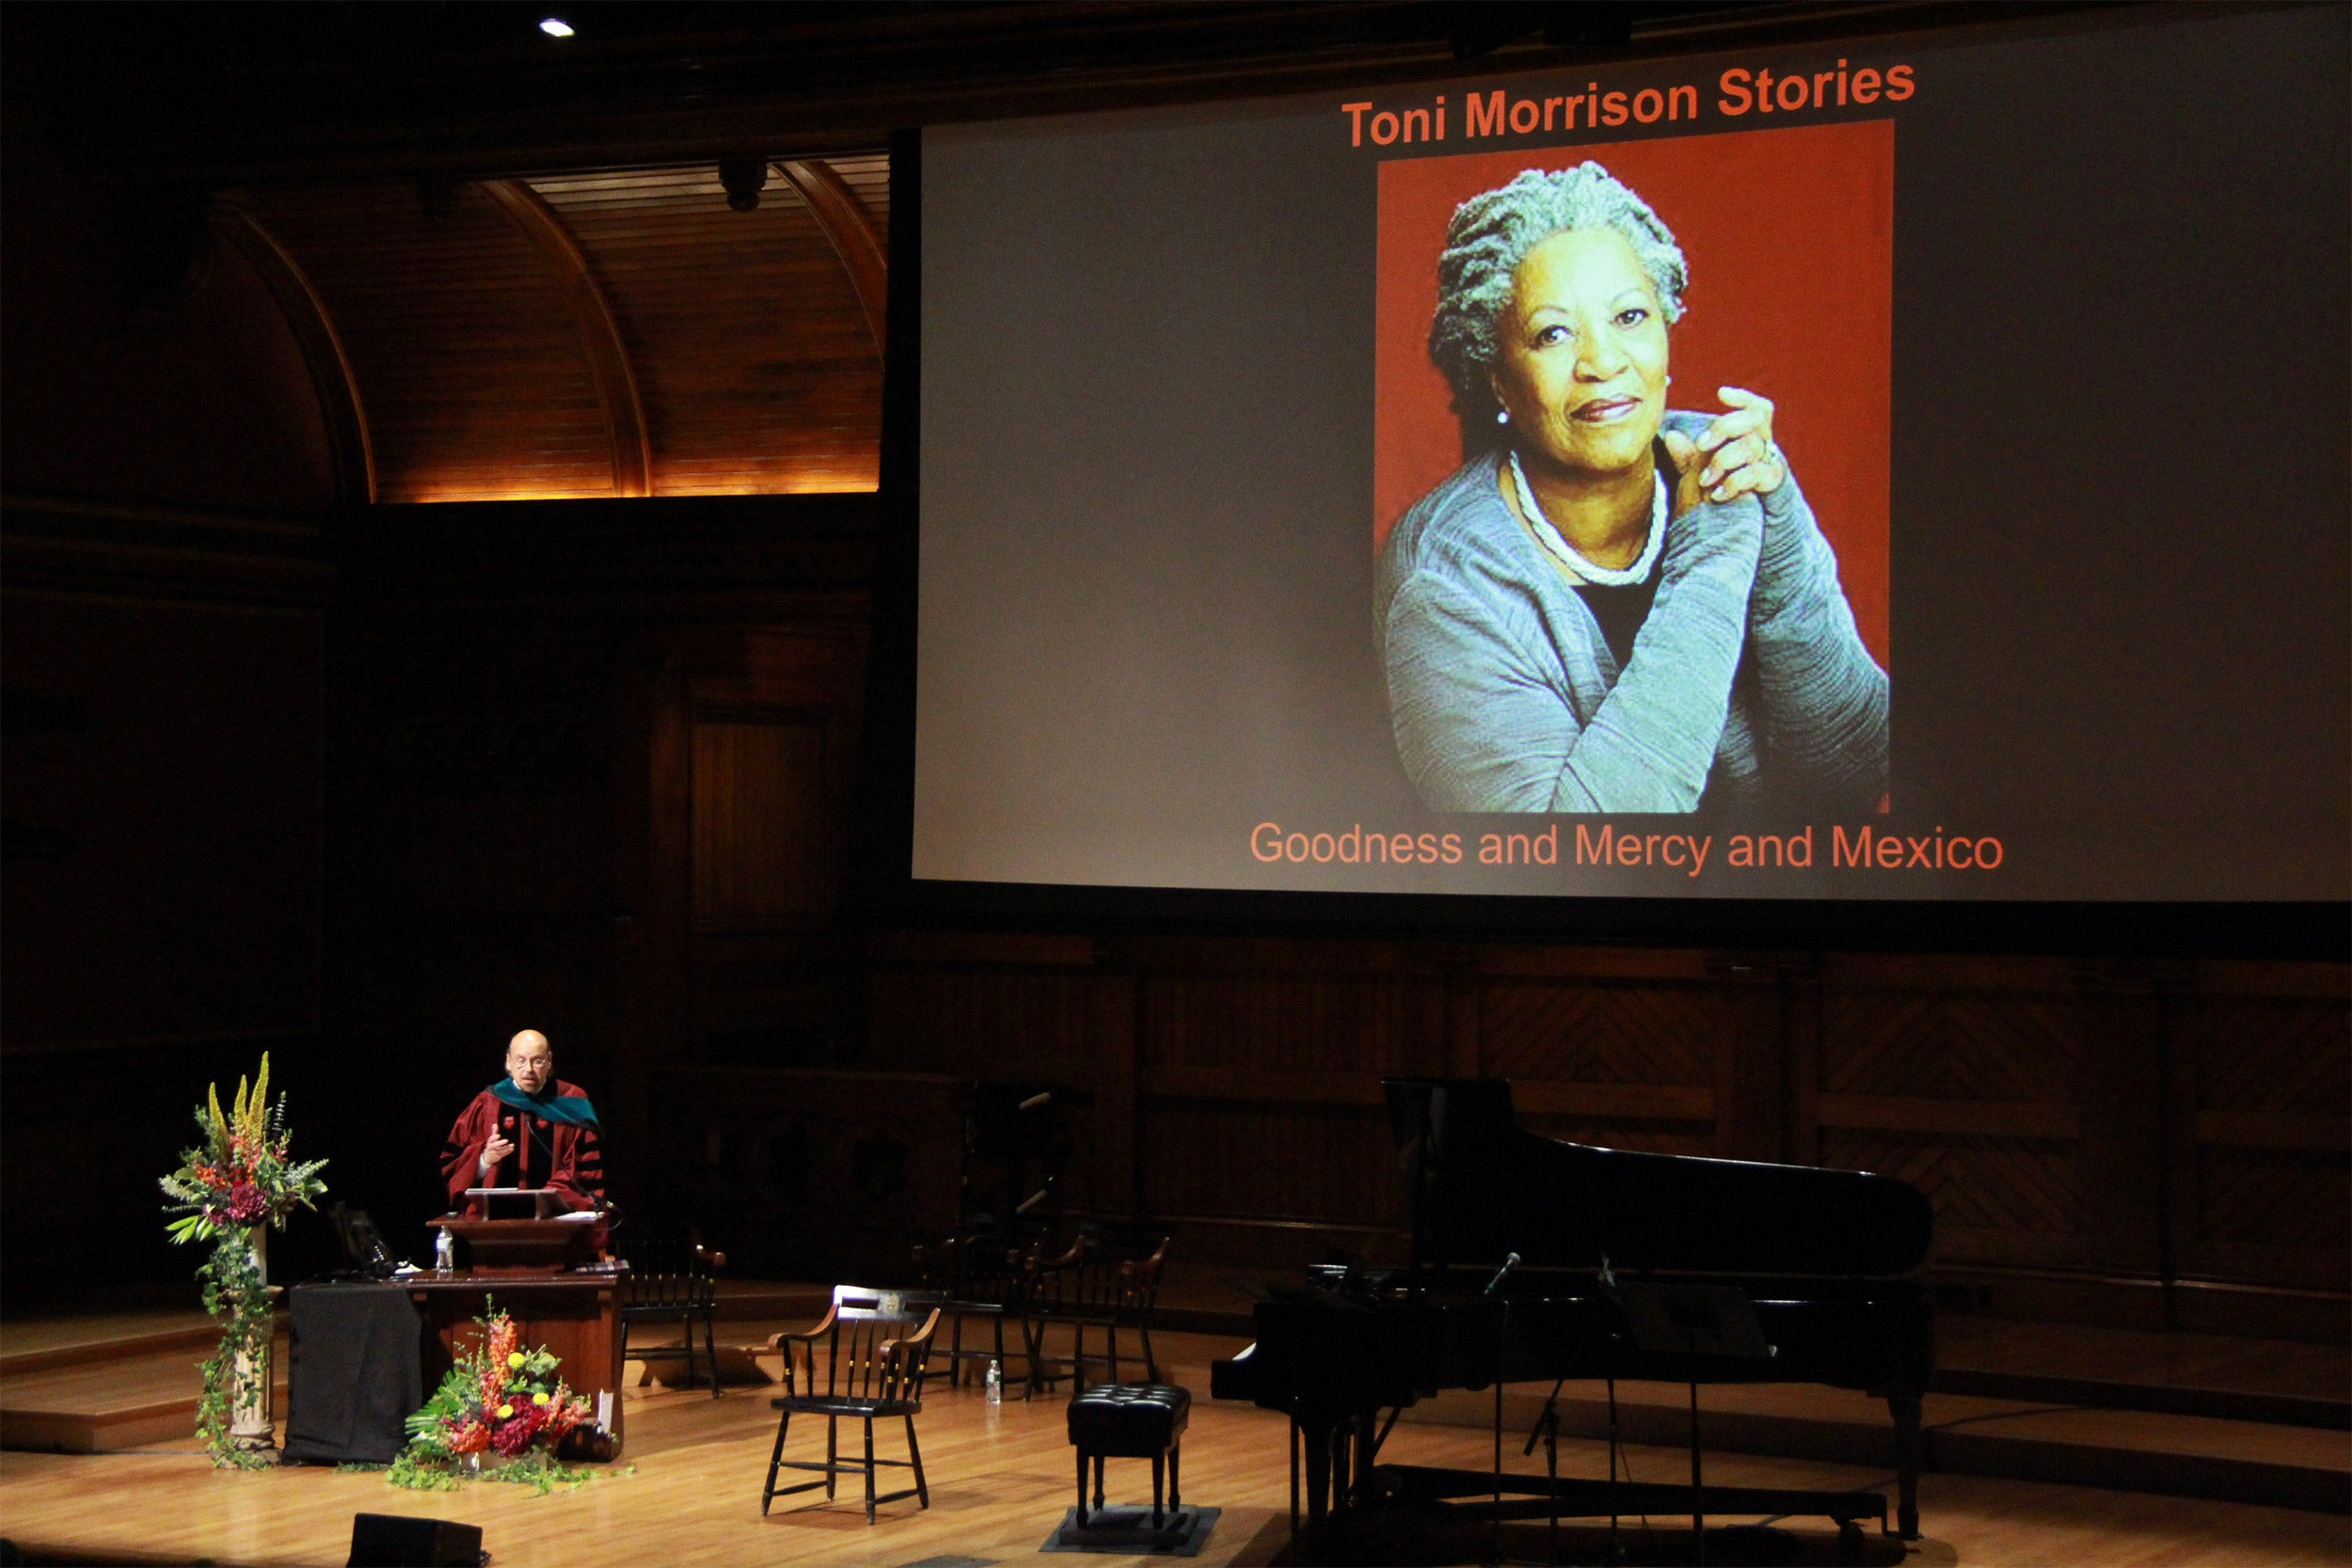 Toni Morrison on the big screen